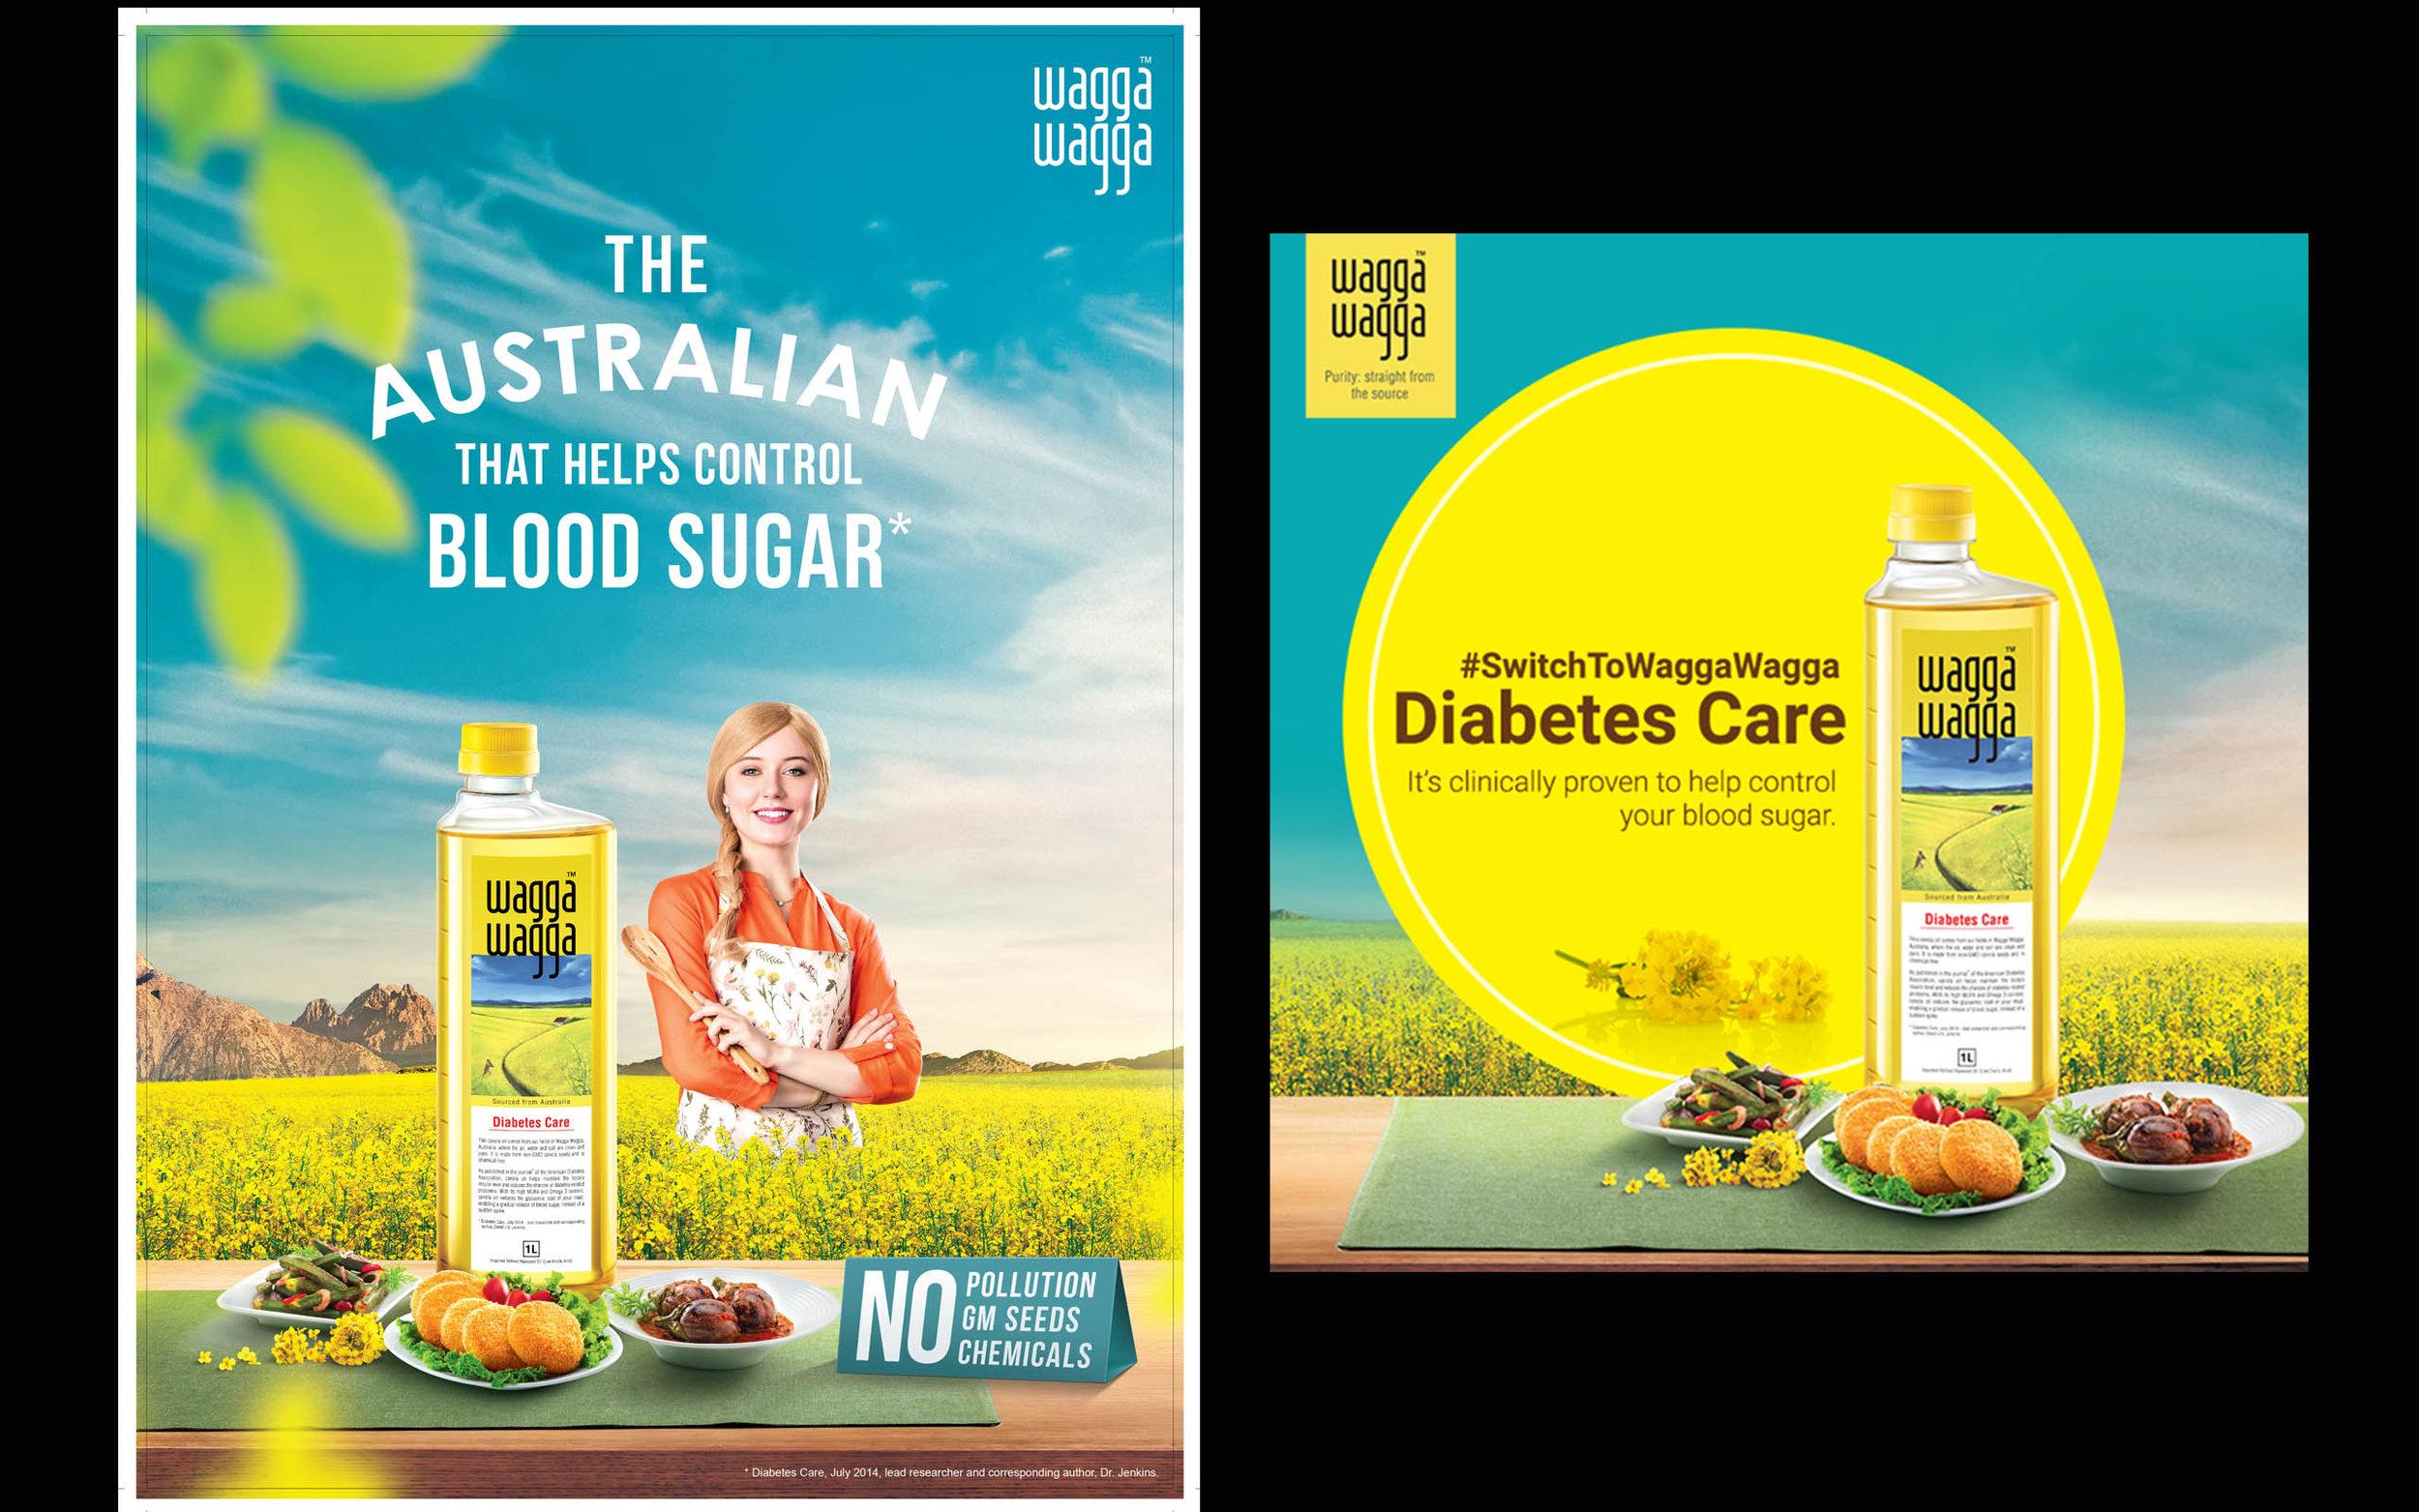 Campaign -Wagga Wagga oils